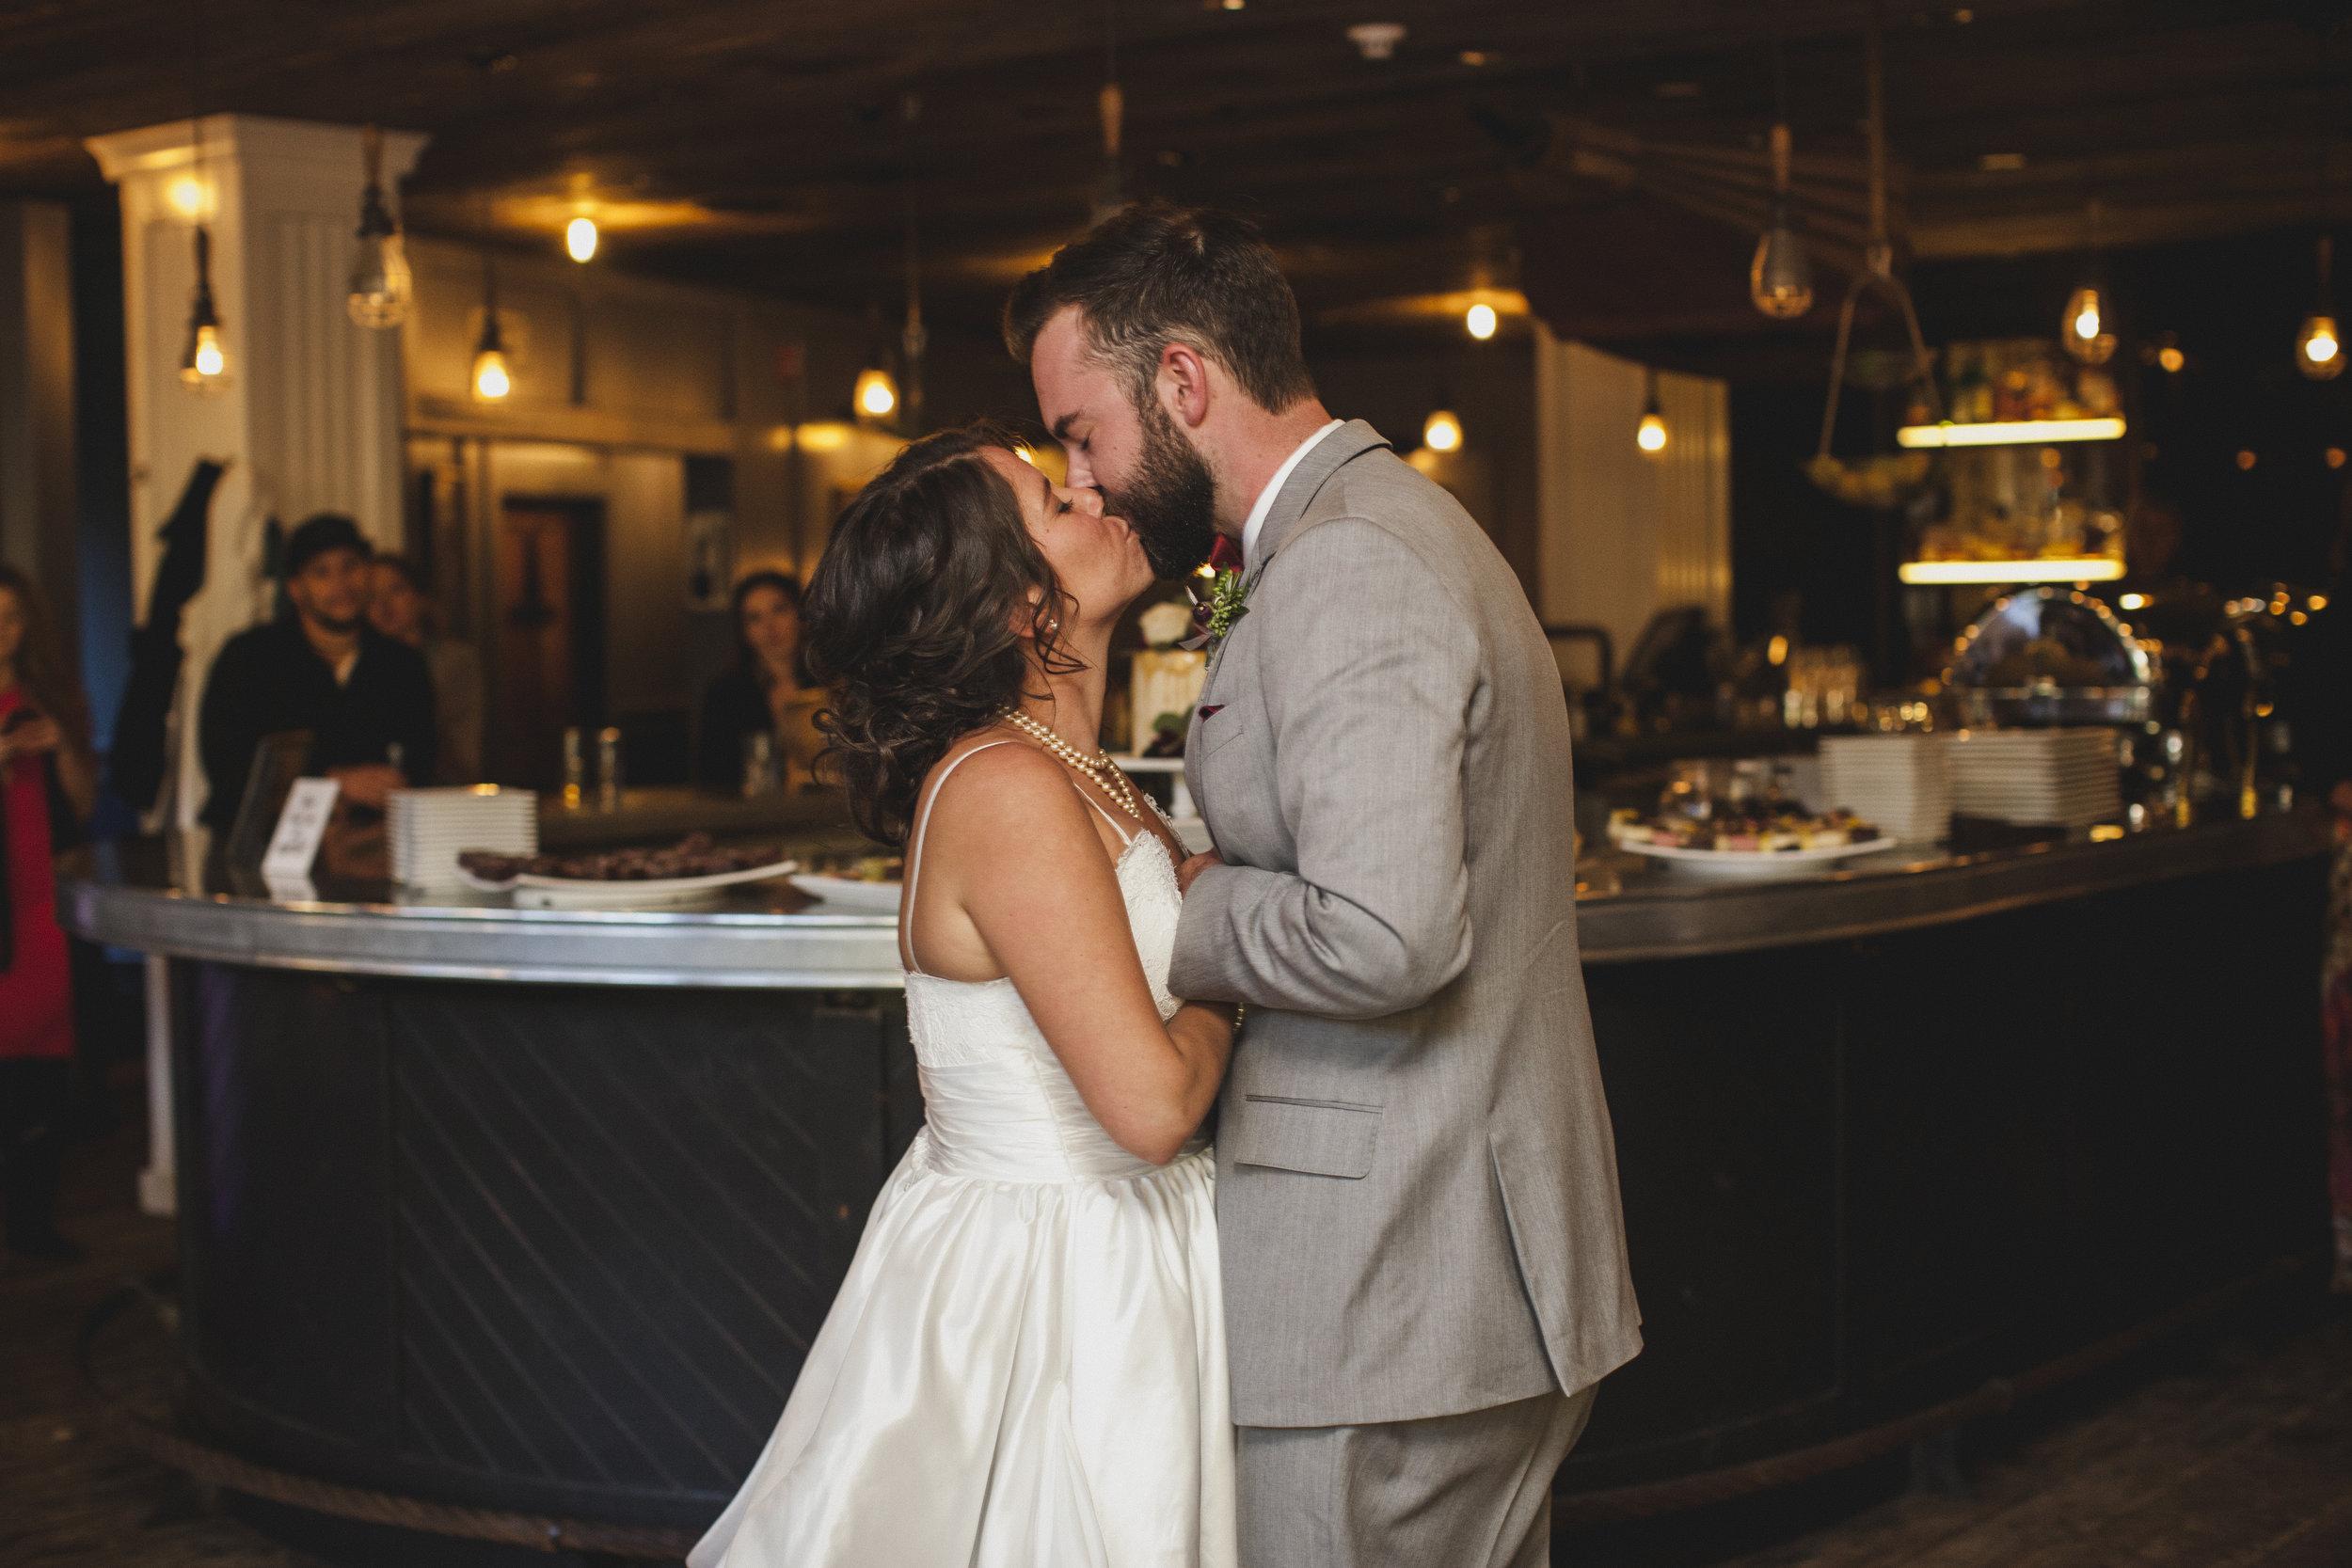 NE-LeahandAshtonphotography-Telluride-Wedding-Photography-7402.jpg